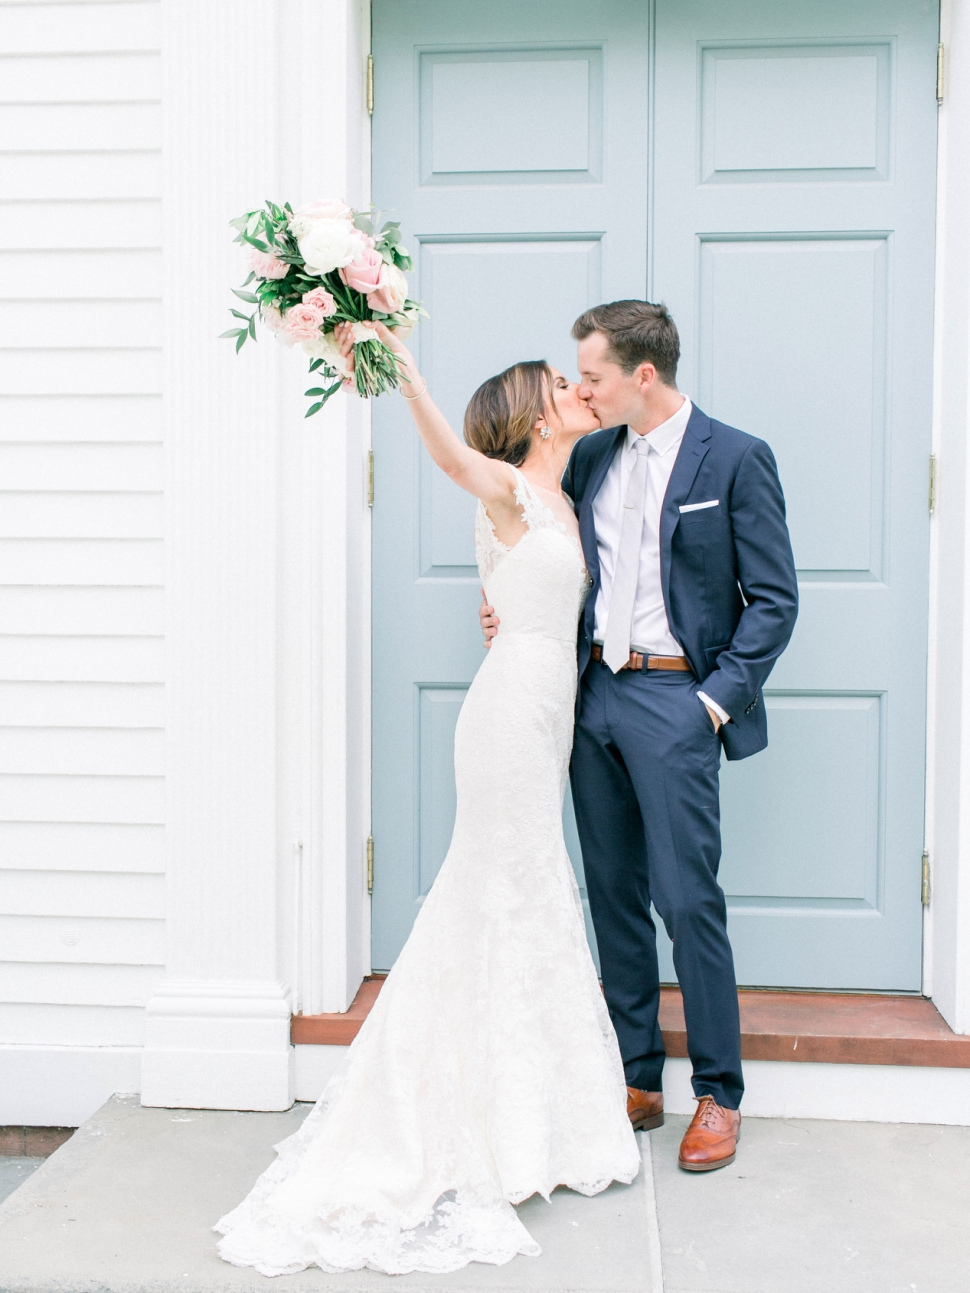 Connecticut-Wedding-Photographer-Cassi-Claire-Shorehaven-Golf-Club-Wedding_01.jpg